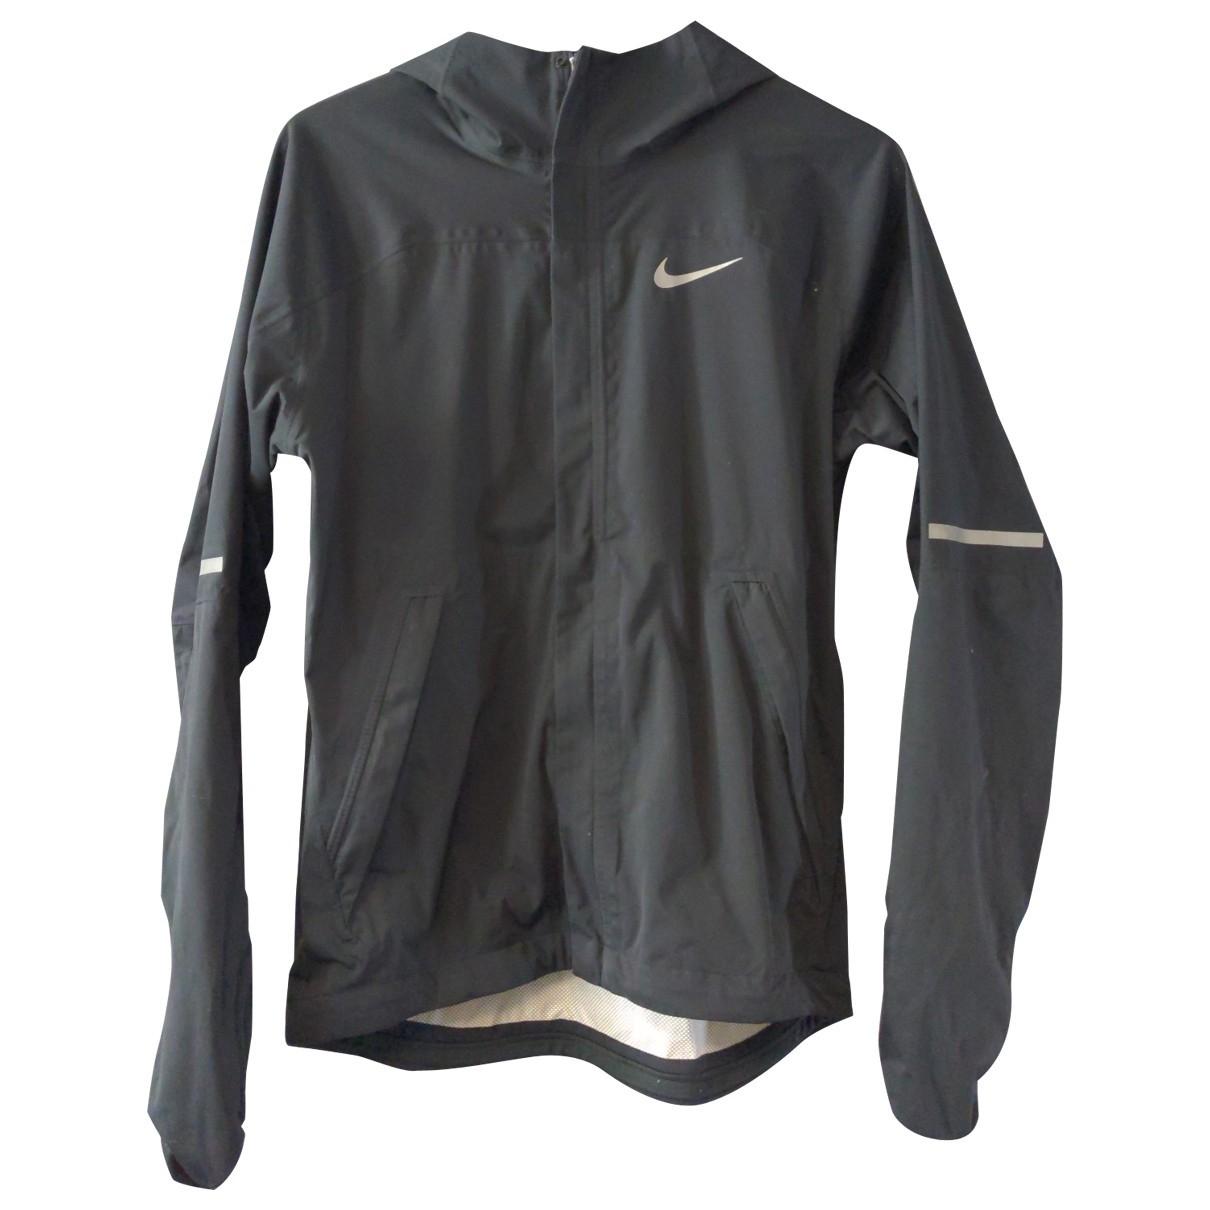 Nike \N Black jacket  for Men S International